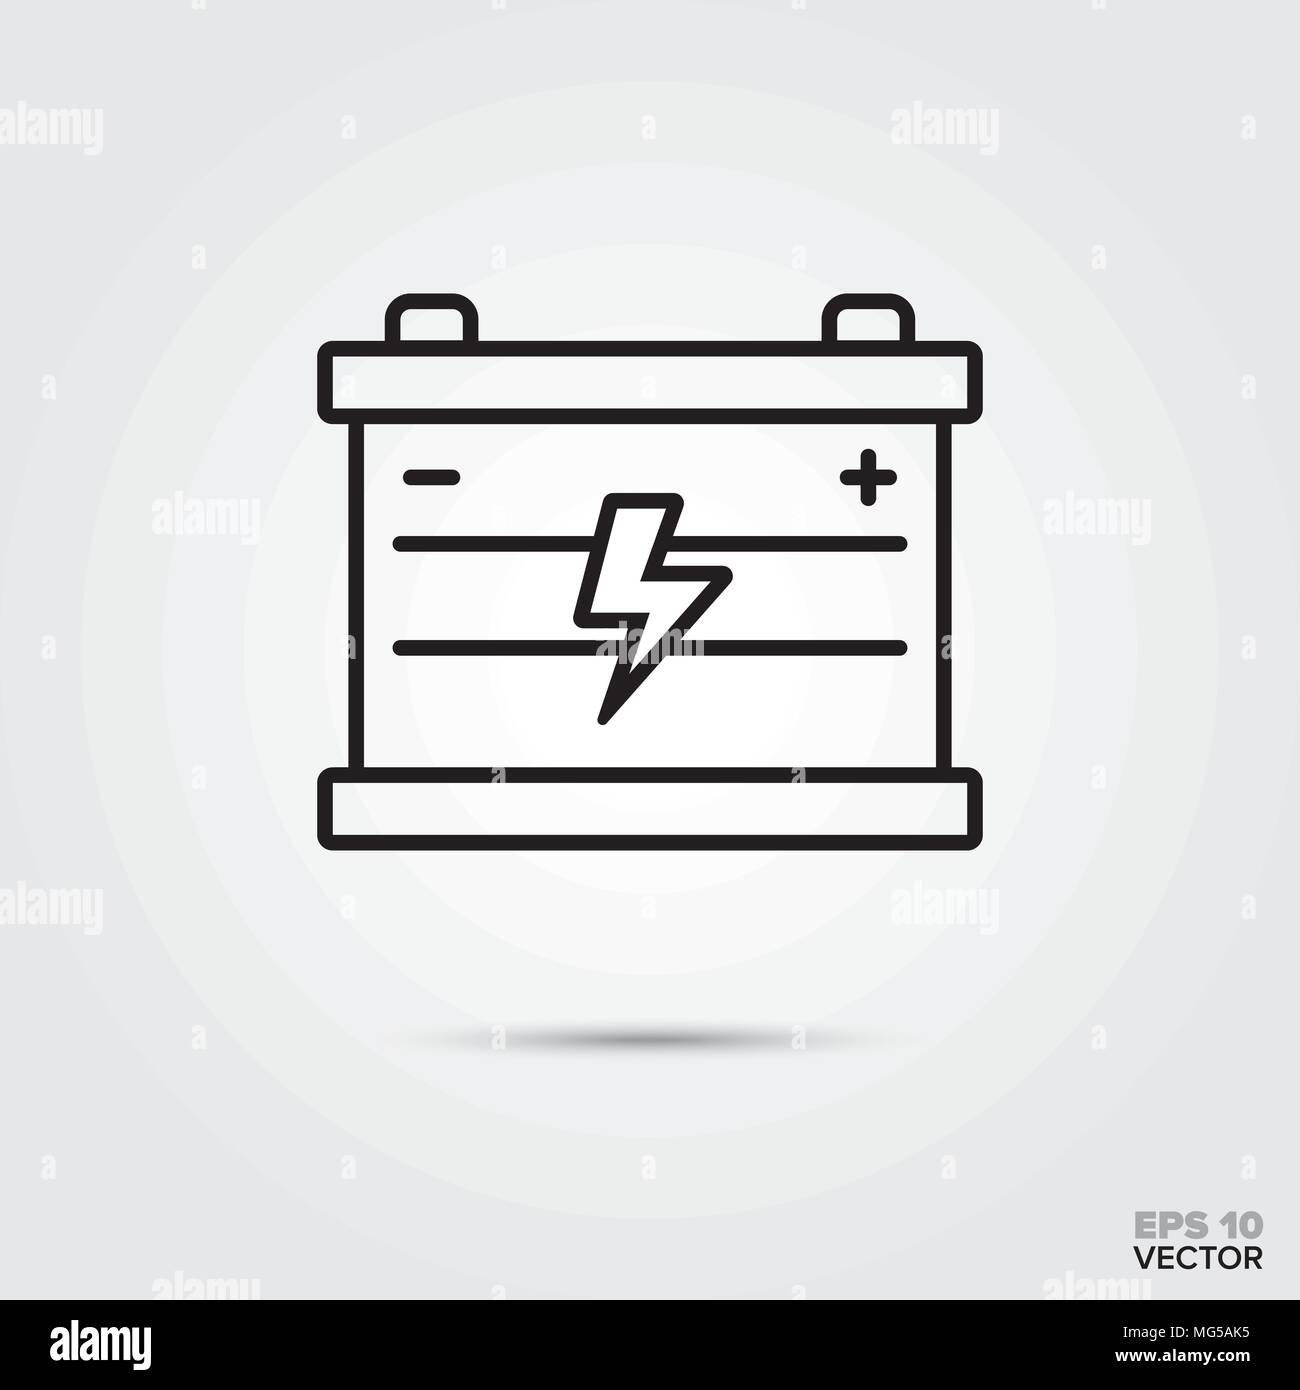 Auto Batterie Vektor Icon Kfz Teile Reparatur Und Service Symbol